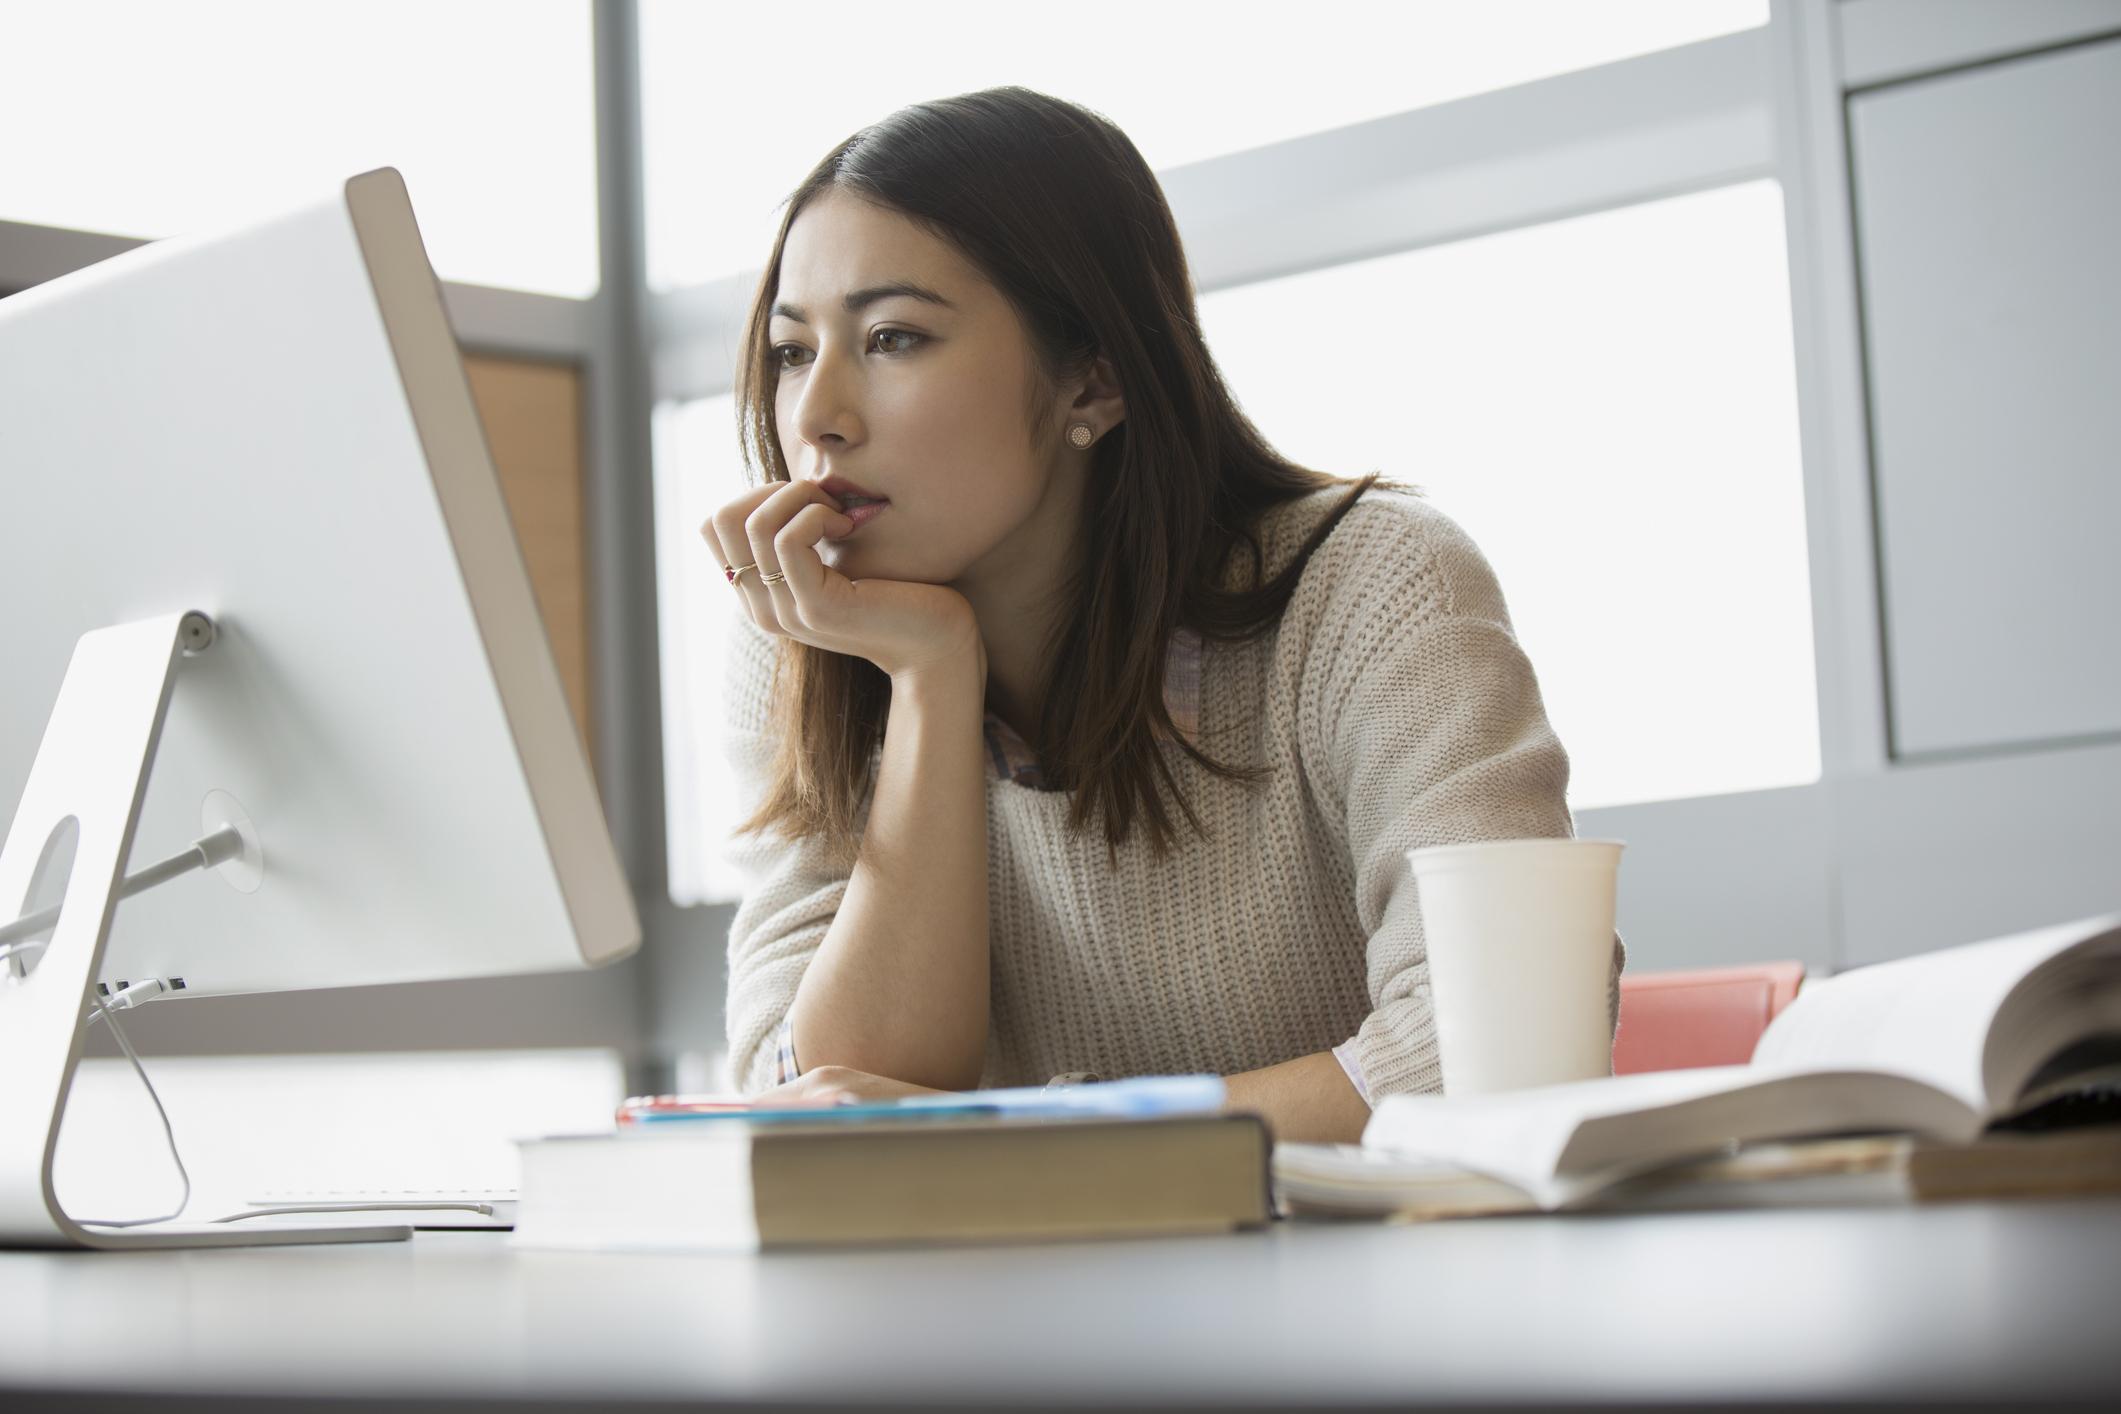 Sebelum memutuskan, pastikan kamu mengetahui perbedaan IELTS dan TOEFL terlebih dahulu - Edu2Review